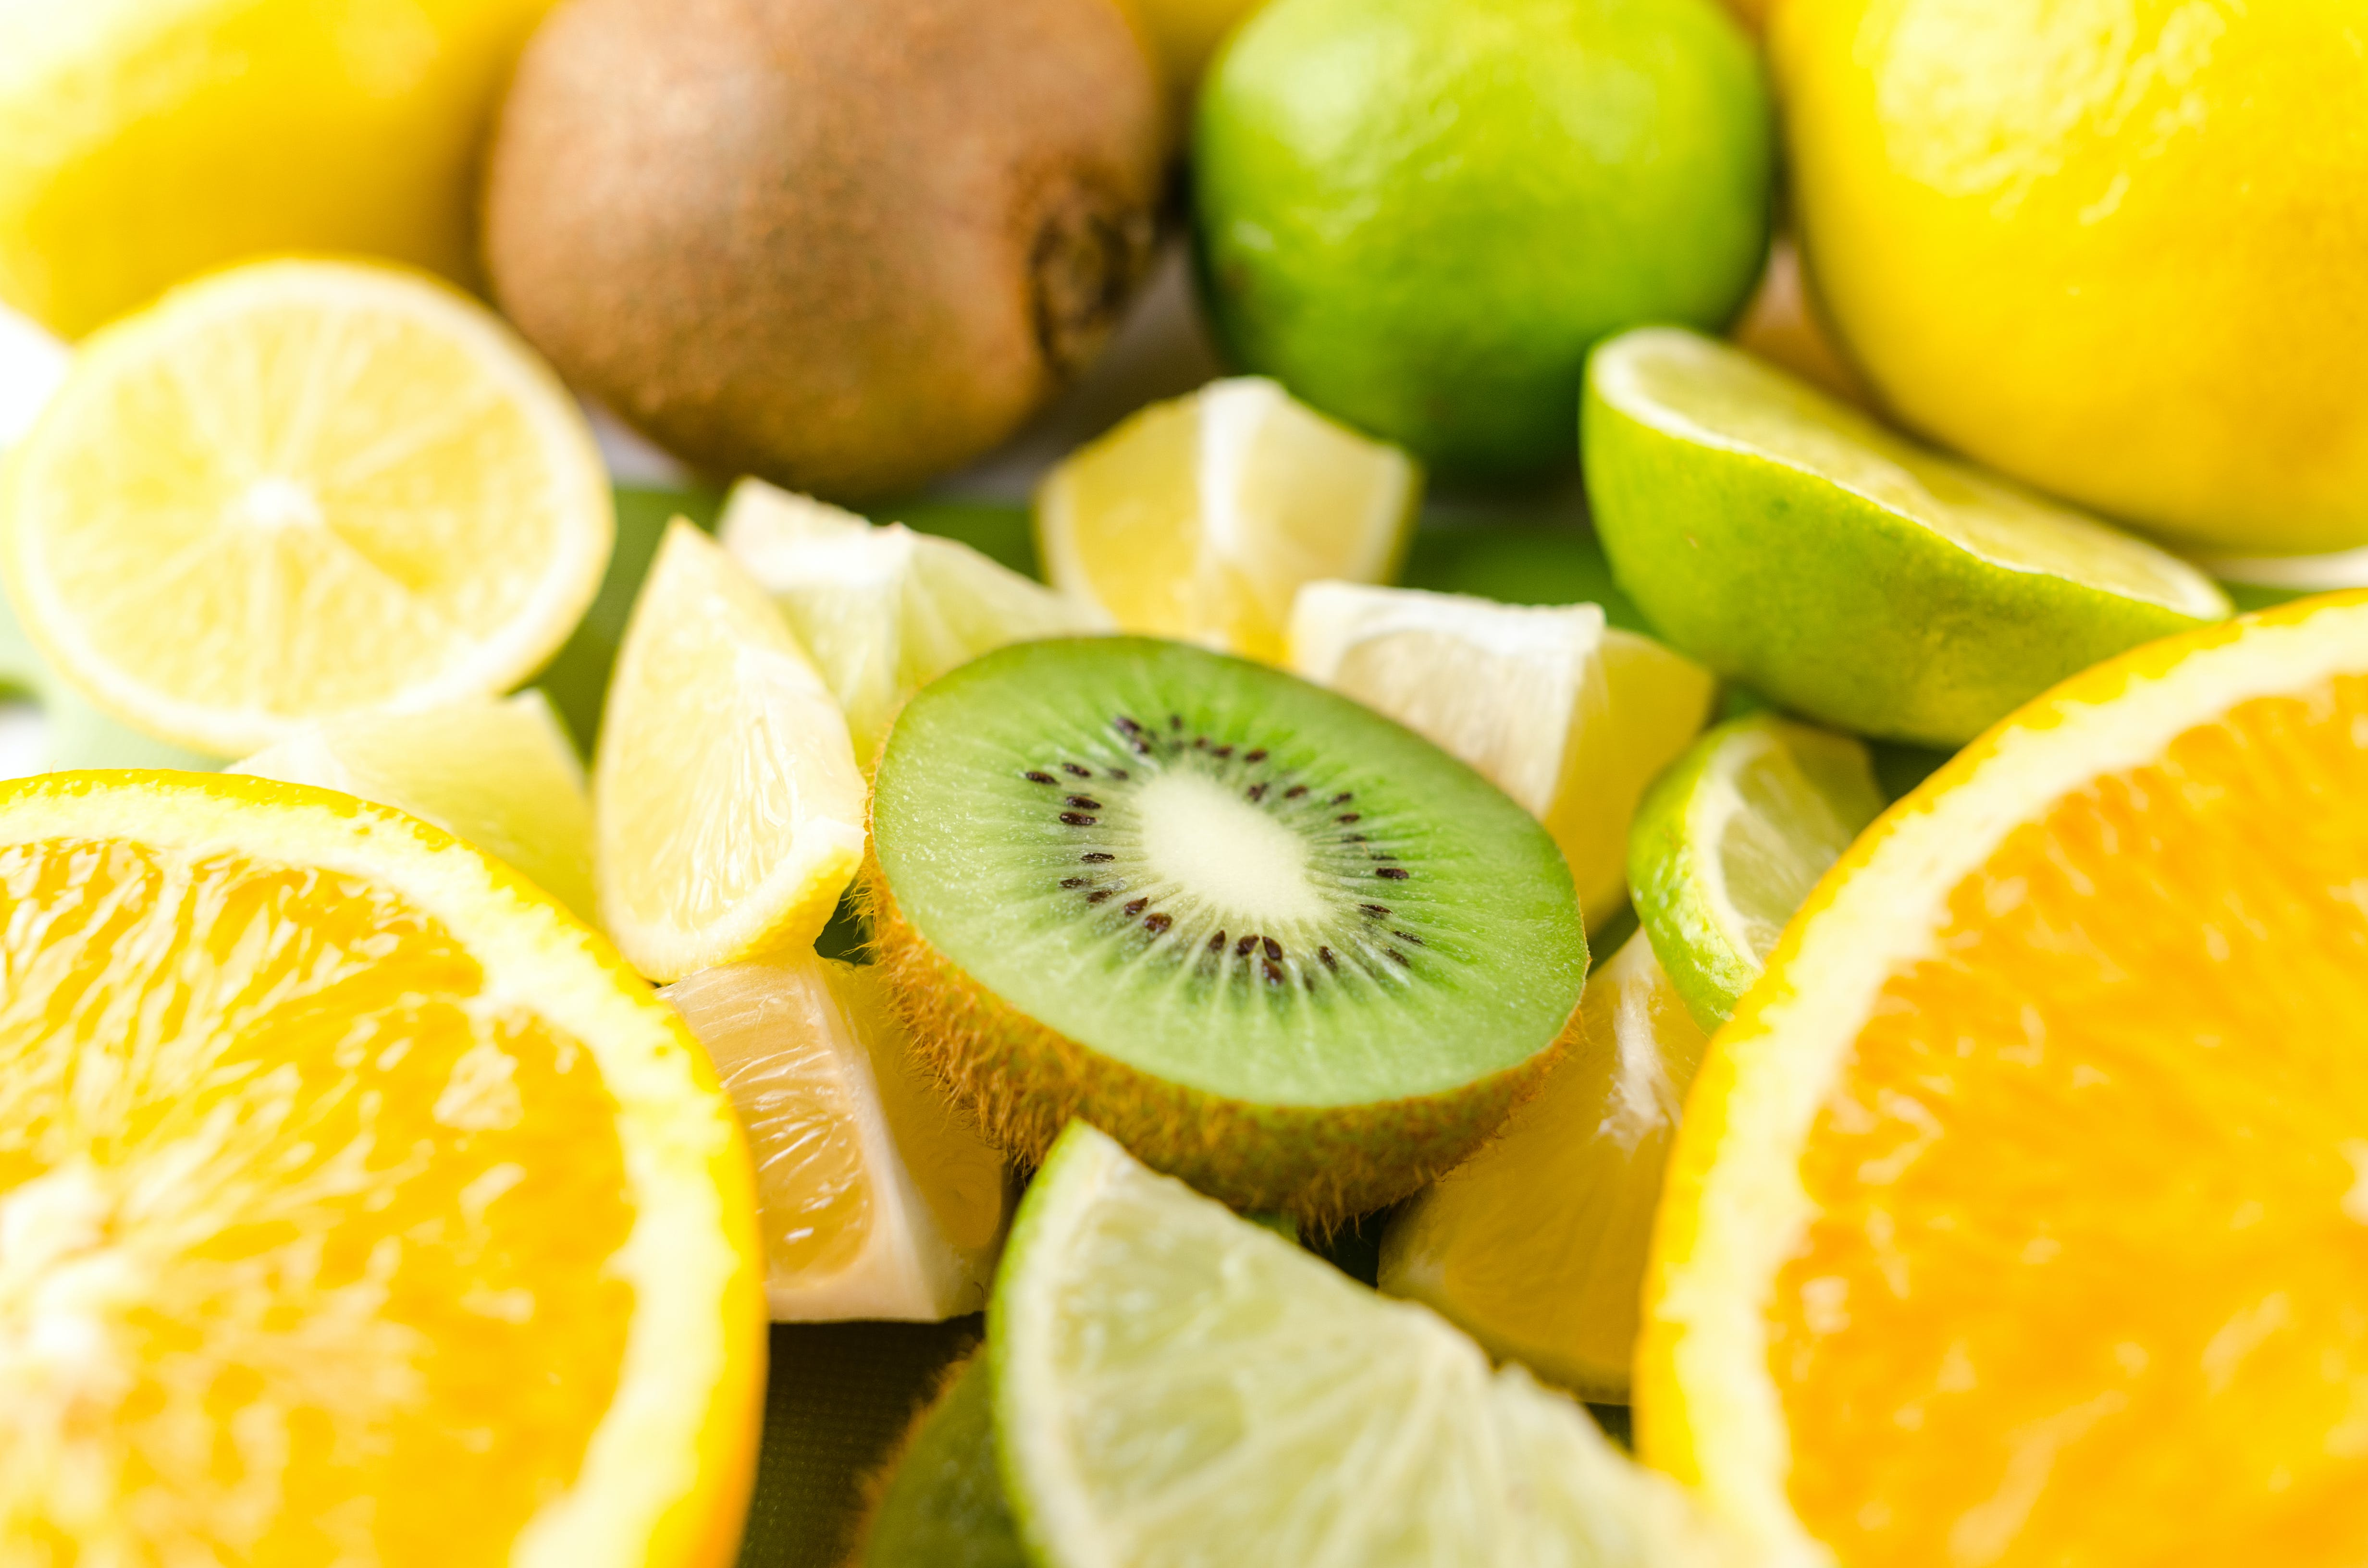 appelsin, Citrus, close-up